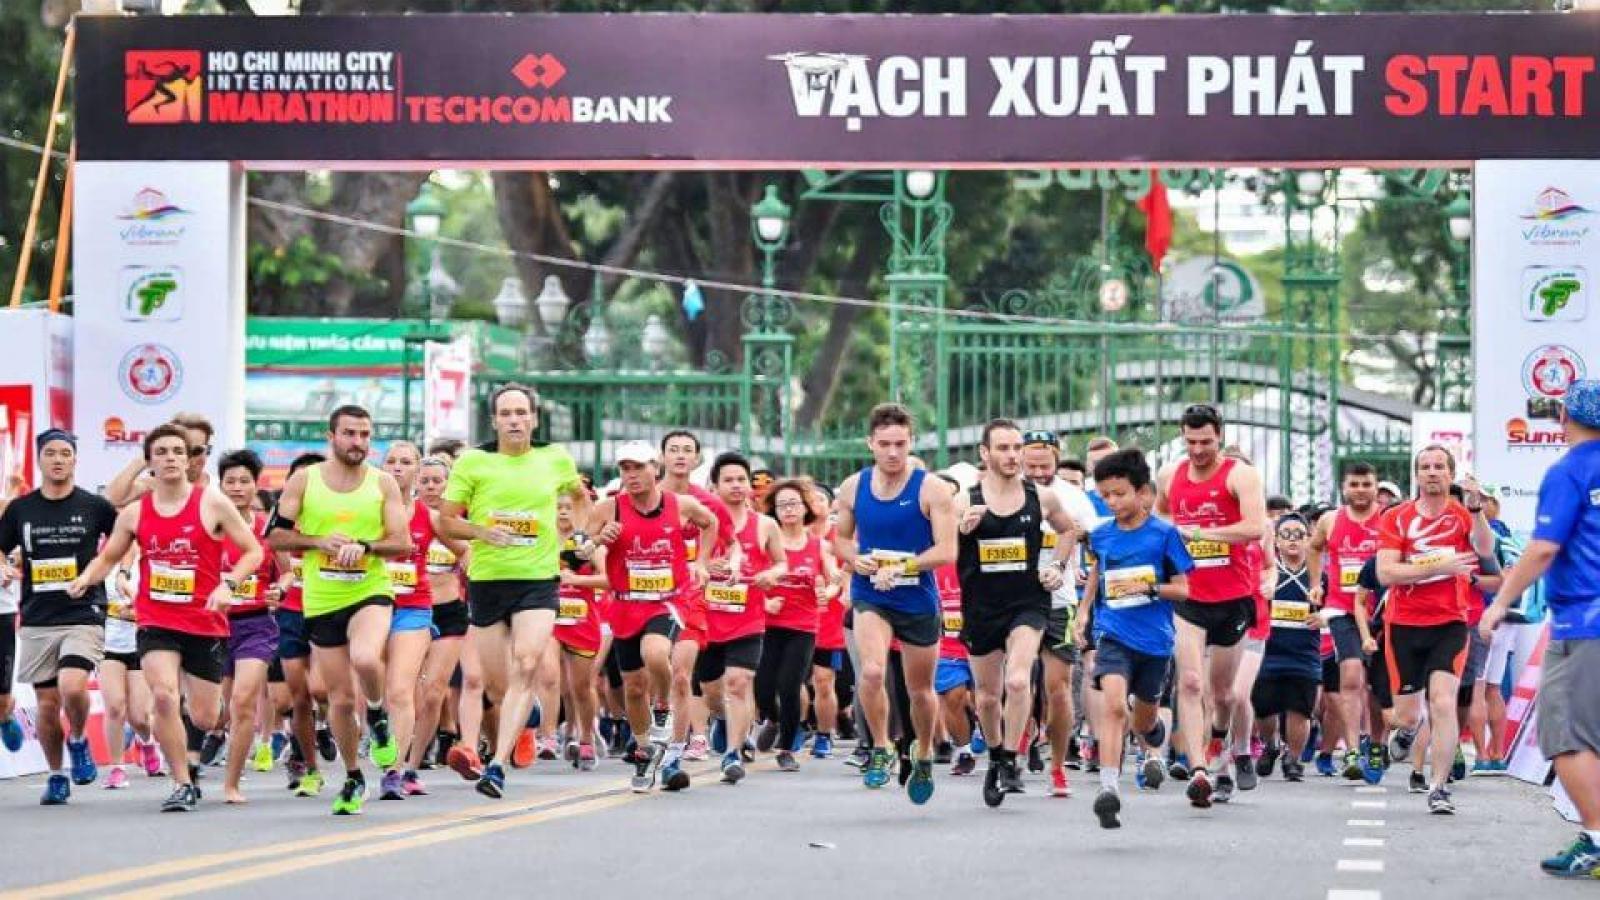 Over 13,000 athletes join HCM City International Marathon